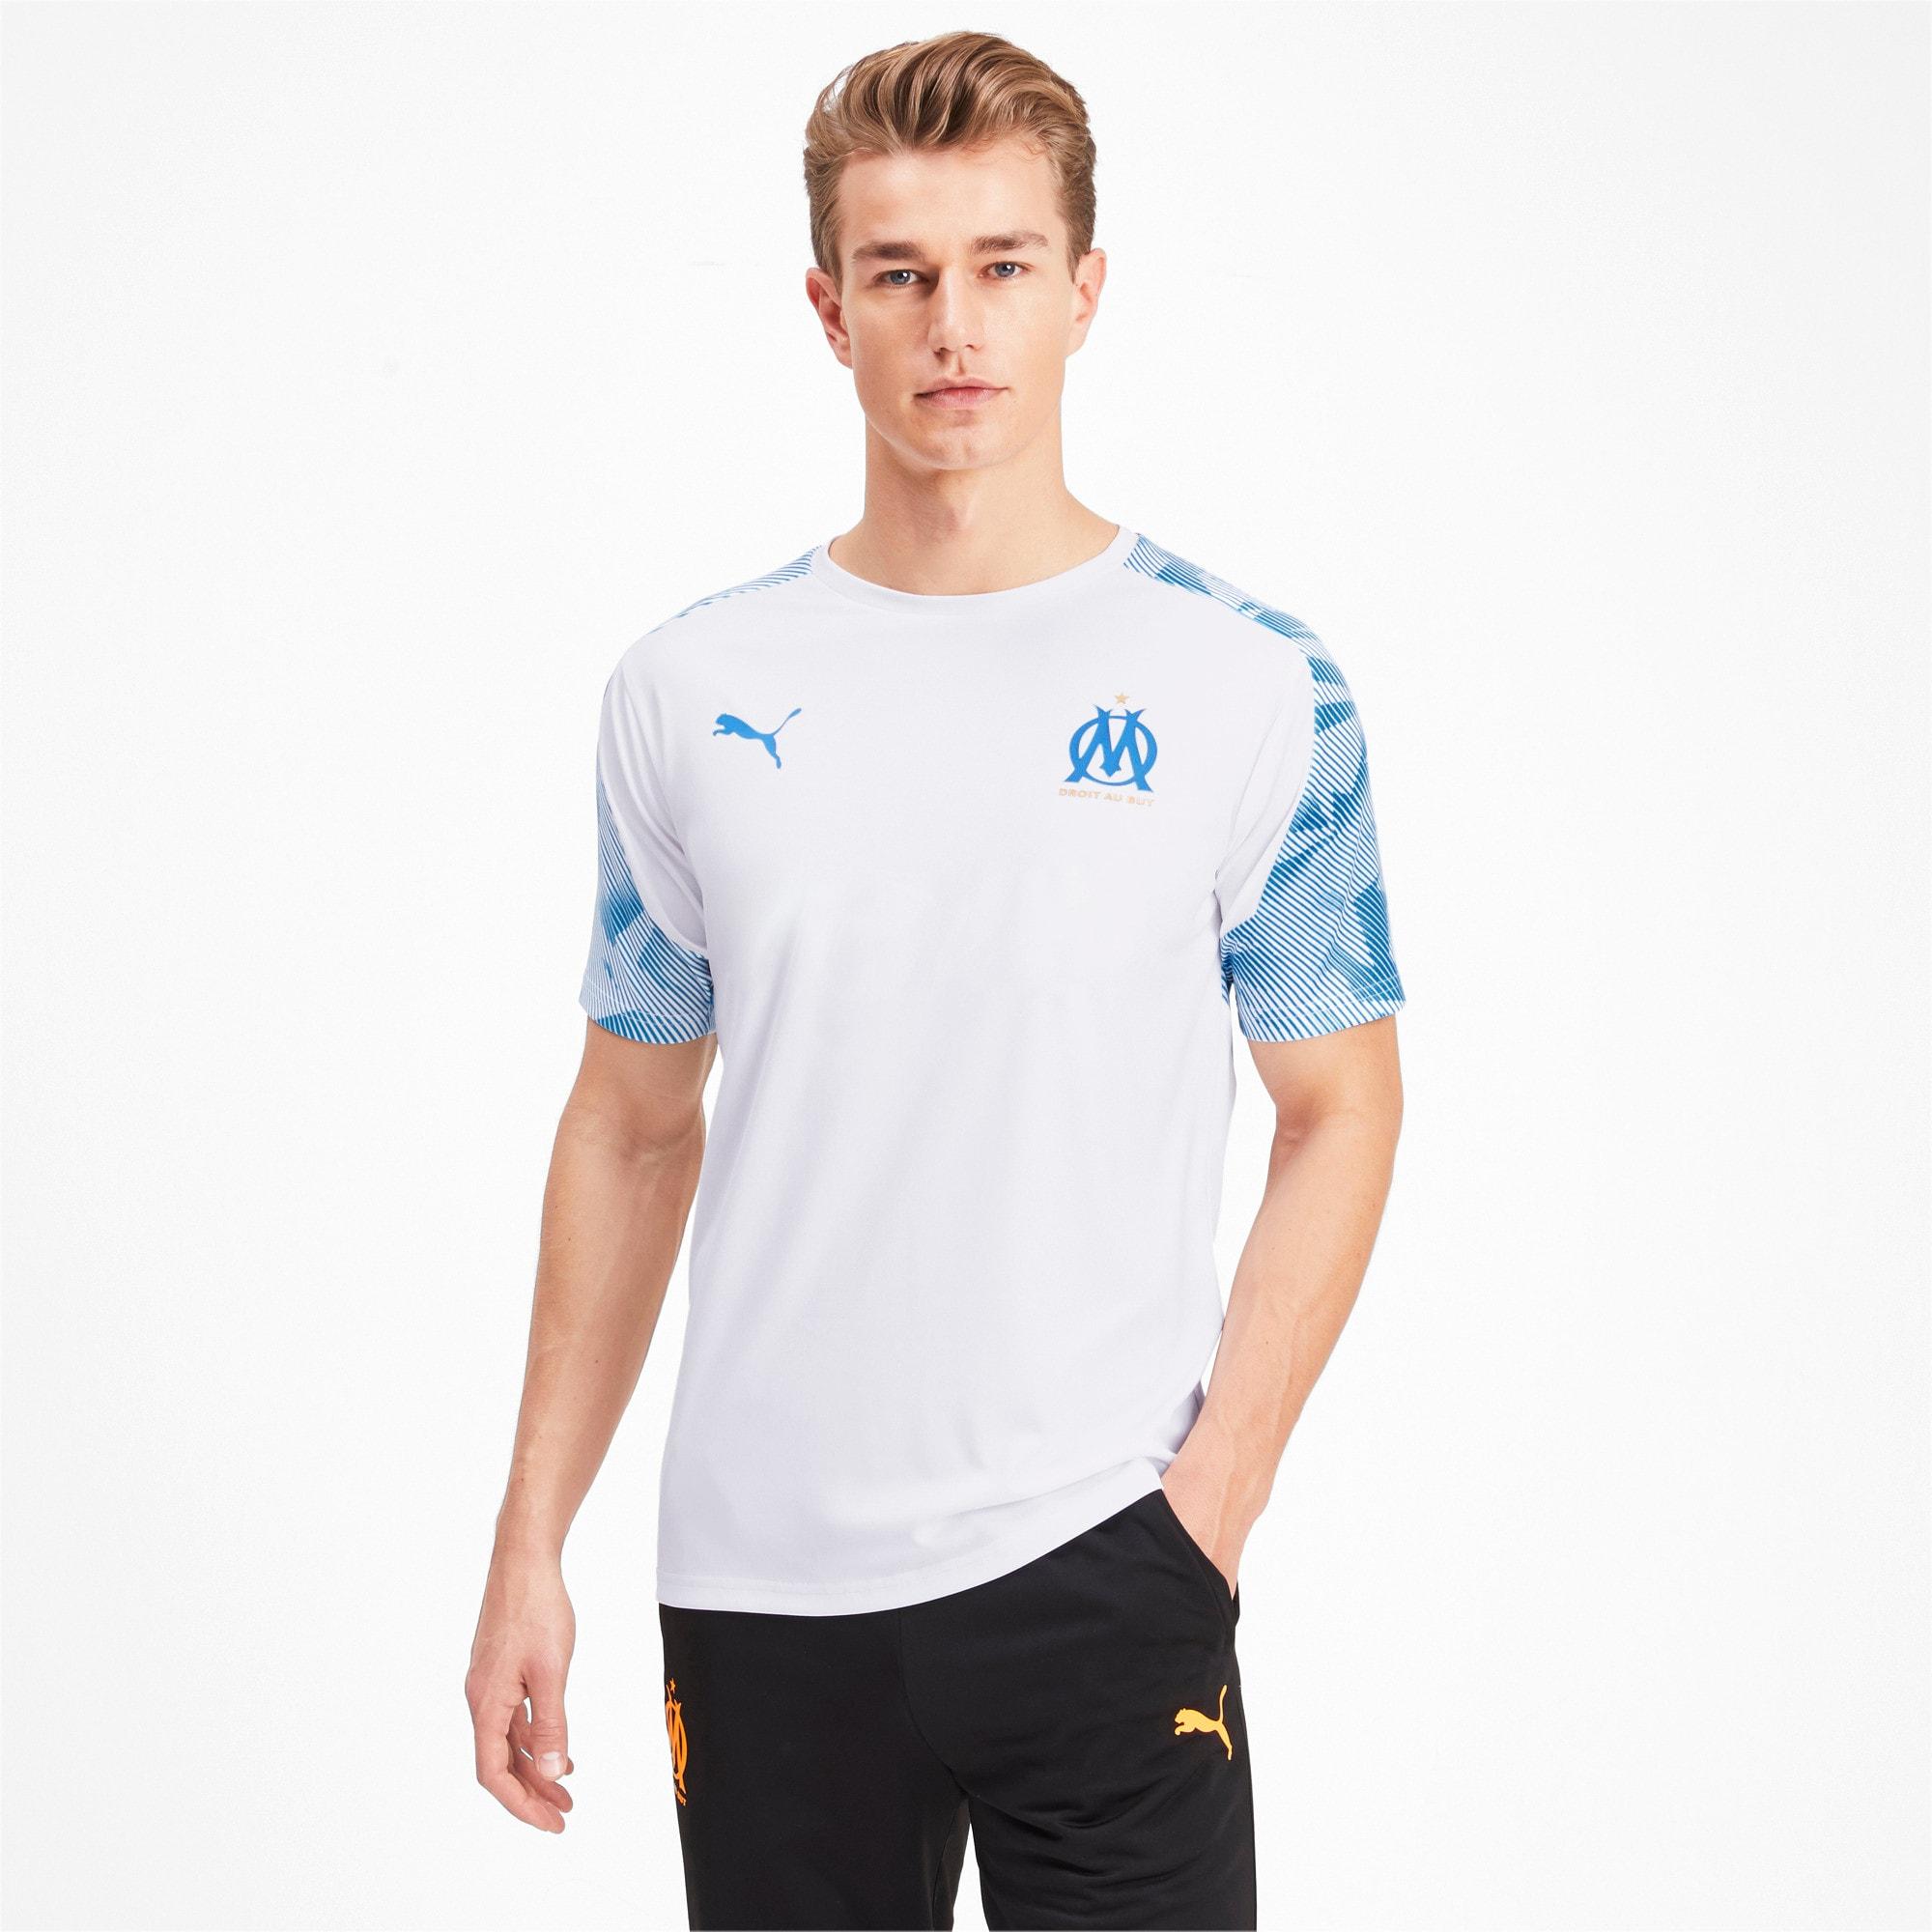 Thumbnail 1 of Olympique de Marseille Men's Training Jersey, Puma White-Bleu Azur, medium